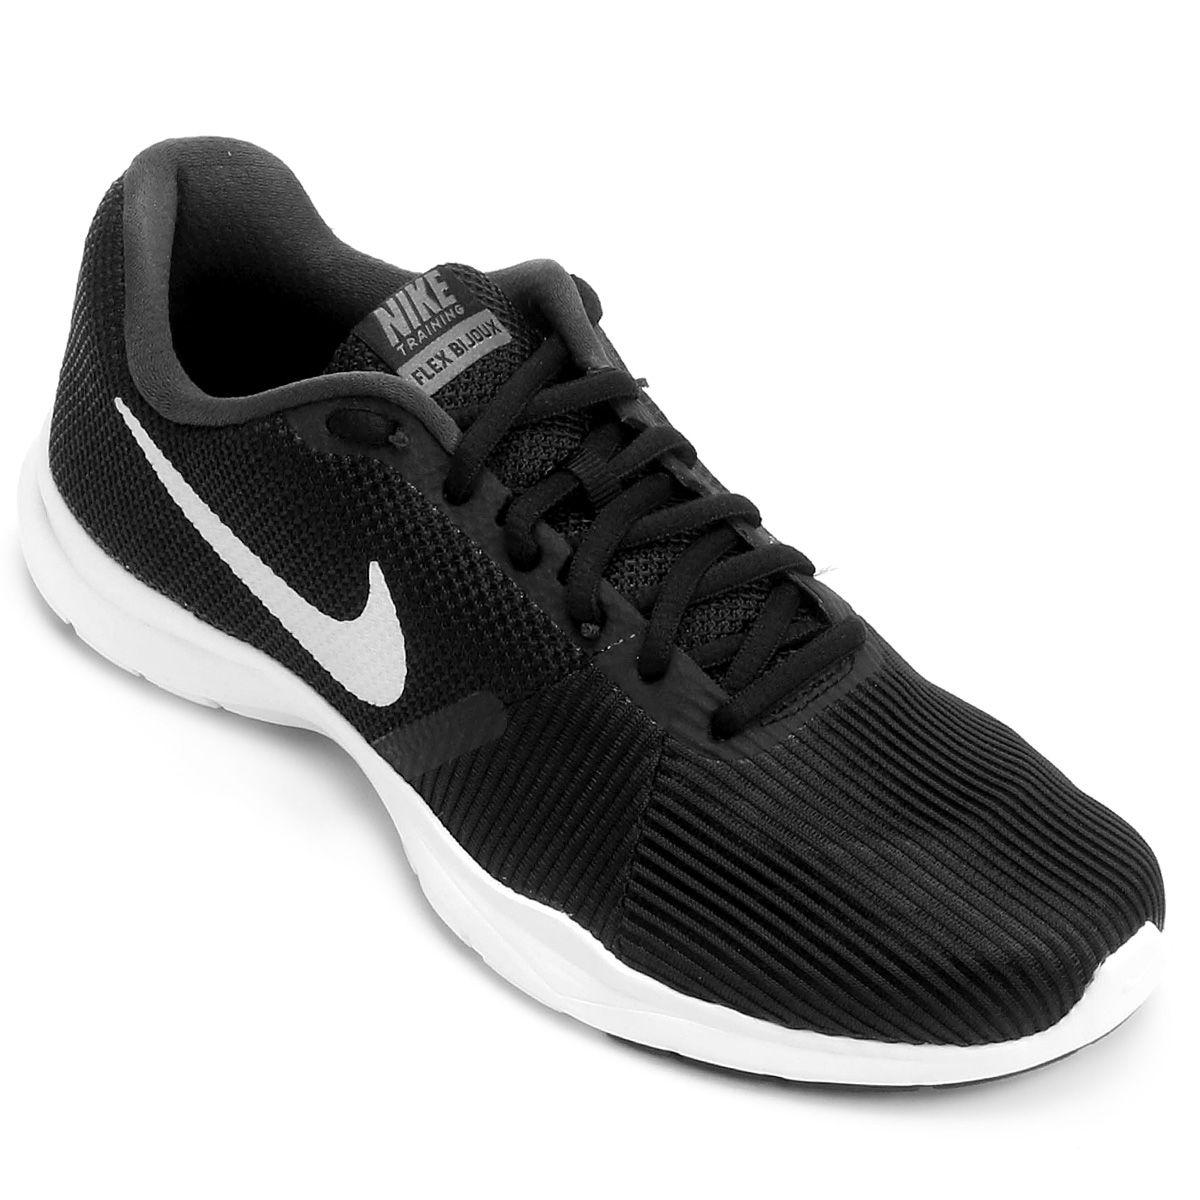 45dd322872 ... lebron james netshoes Tênis Nike Flex Bijoux Feminino - Preto e Branco .